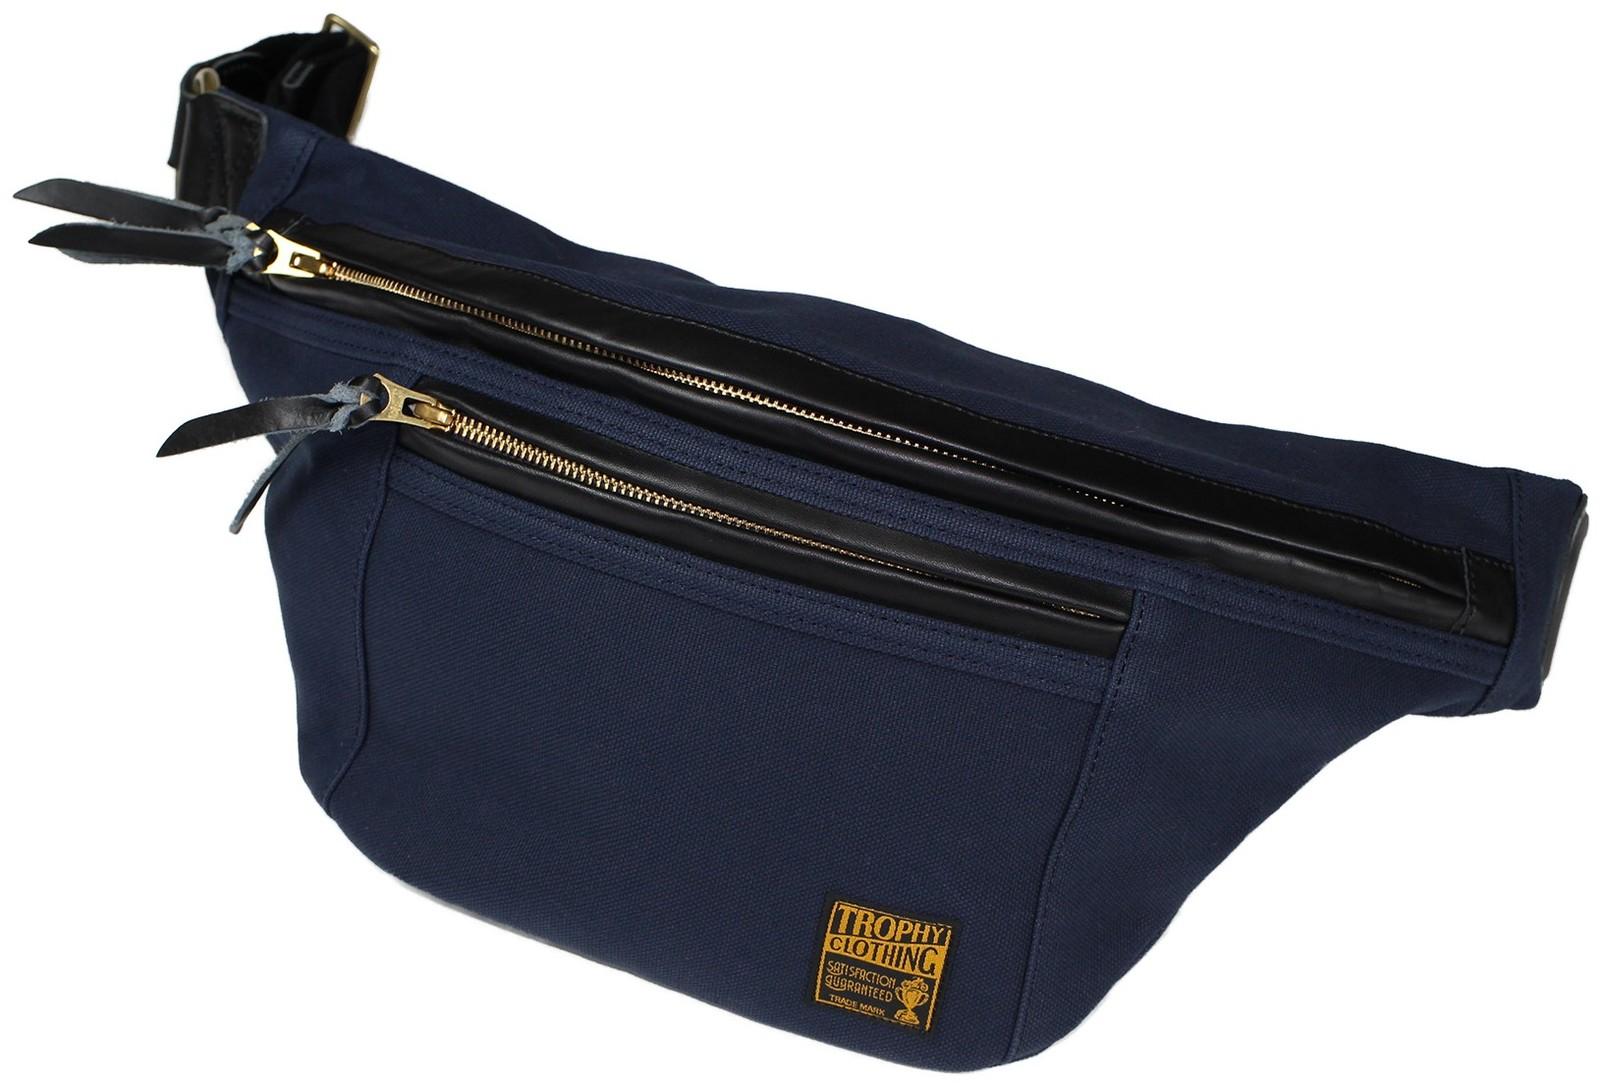 TROPHY CLOTHING [-Day Trip Bag- Navy]